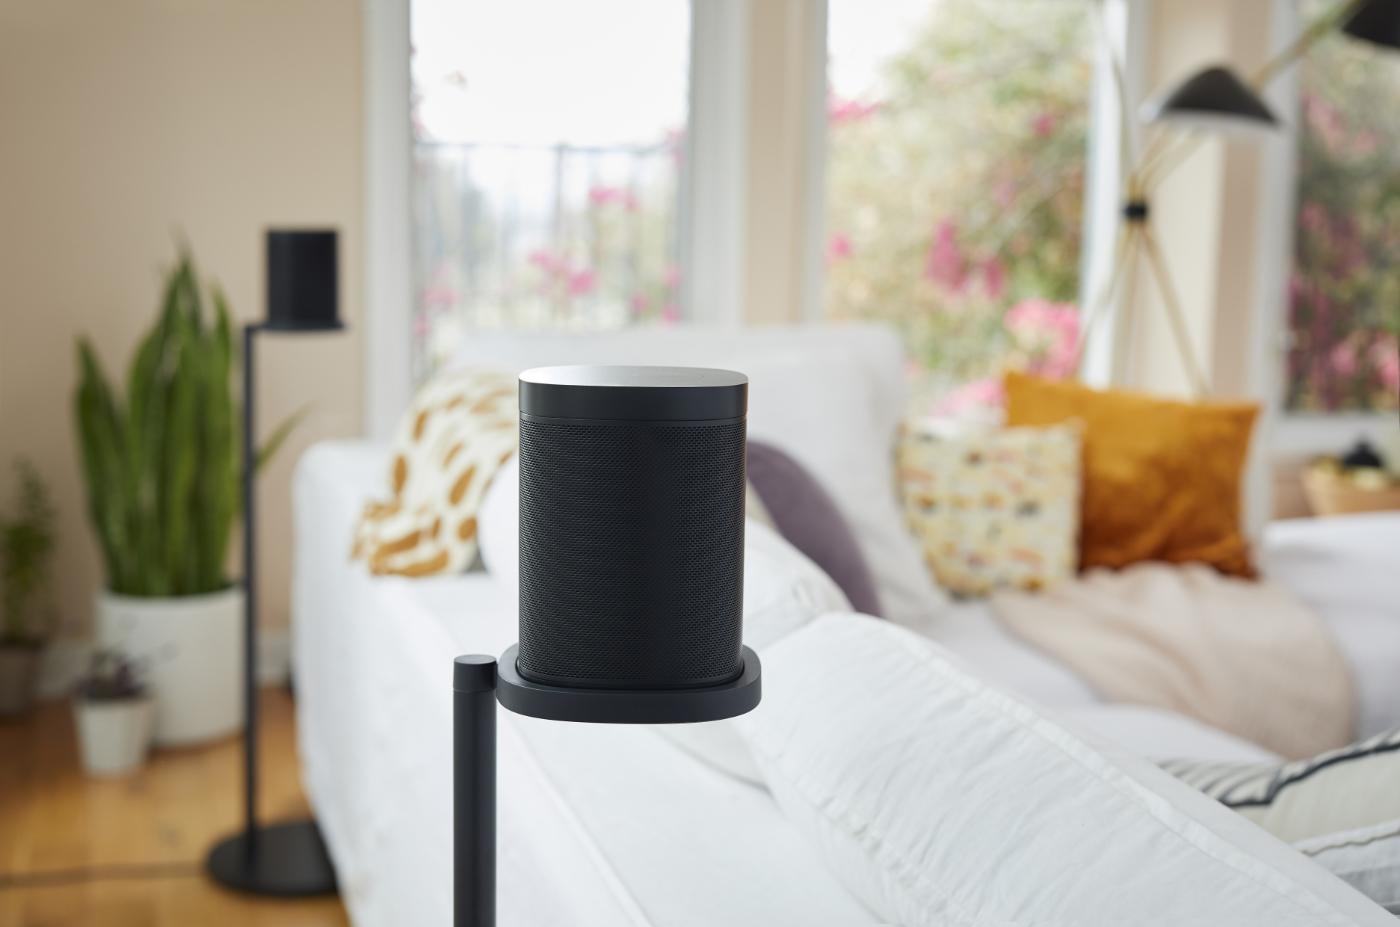 Sonos_Accessories_Stand-Black-Lifestyle_Shot-Living_Room-Q1FY19_Core_Creative_MST-MST_JPEG_fid23715